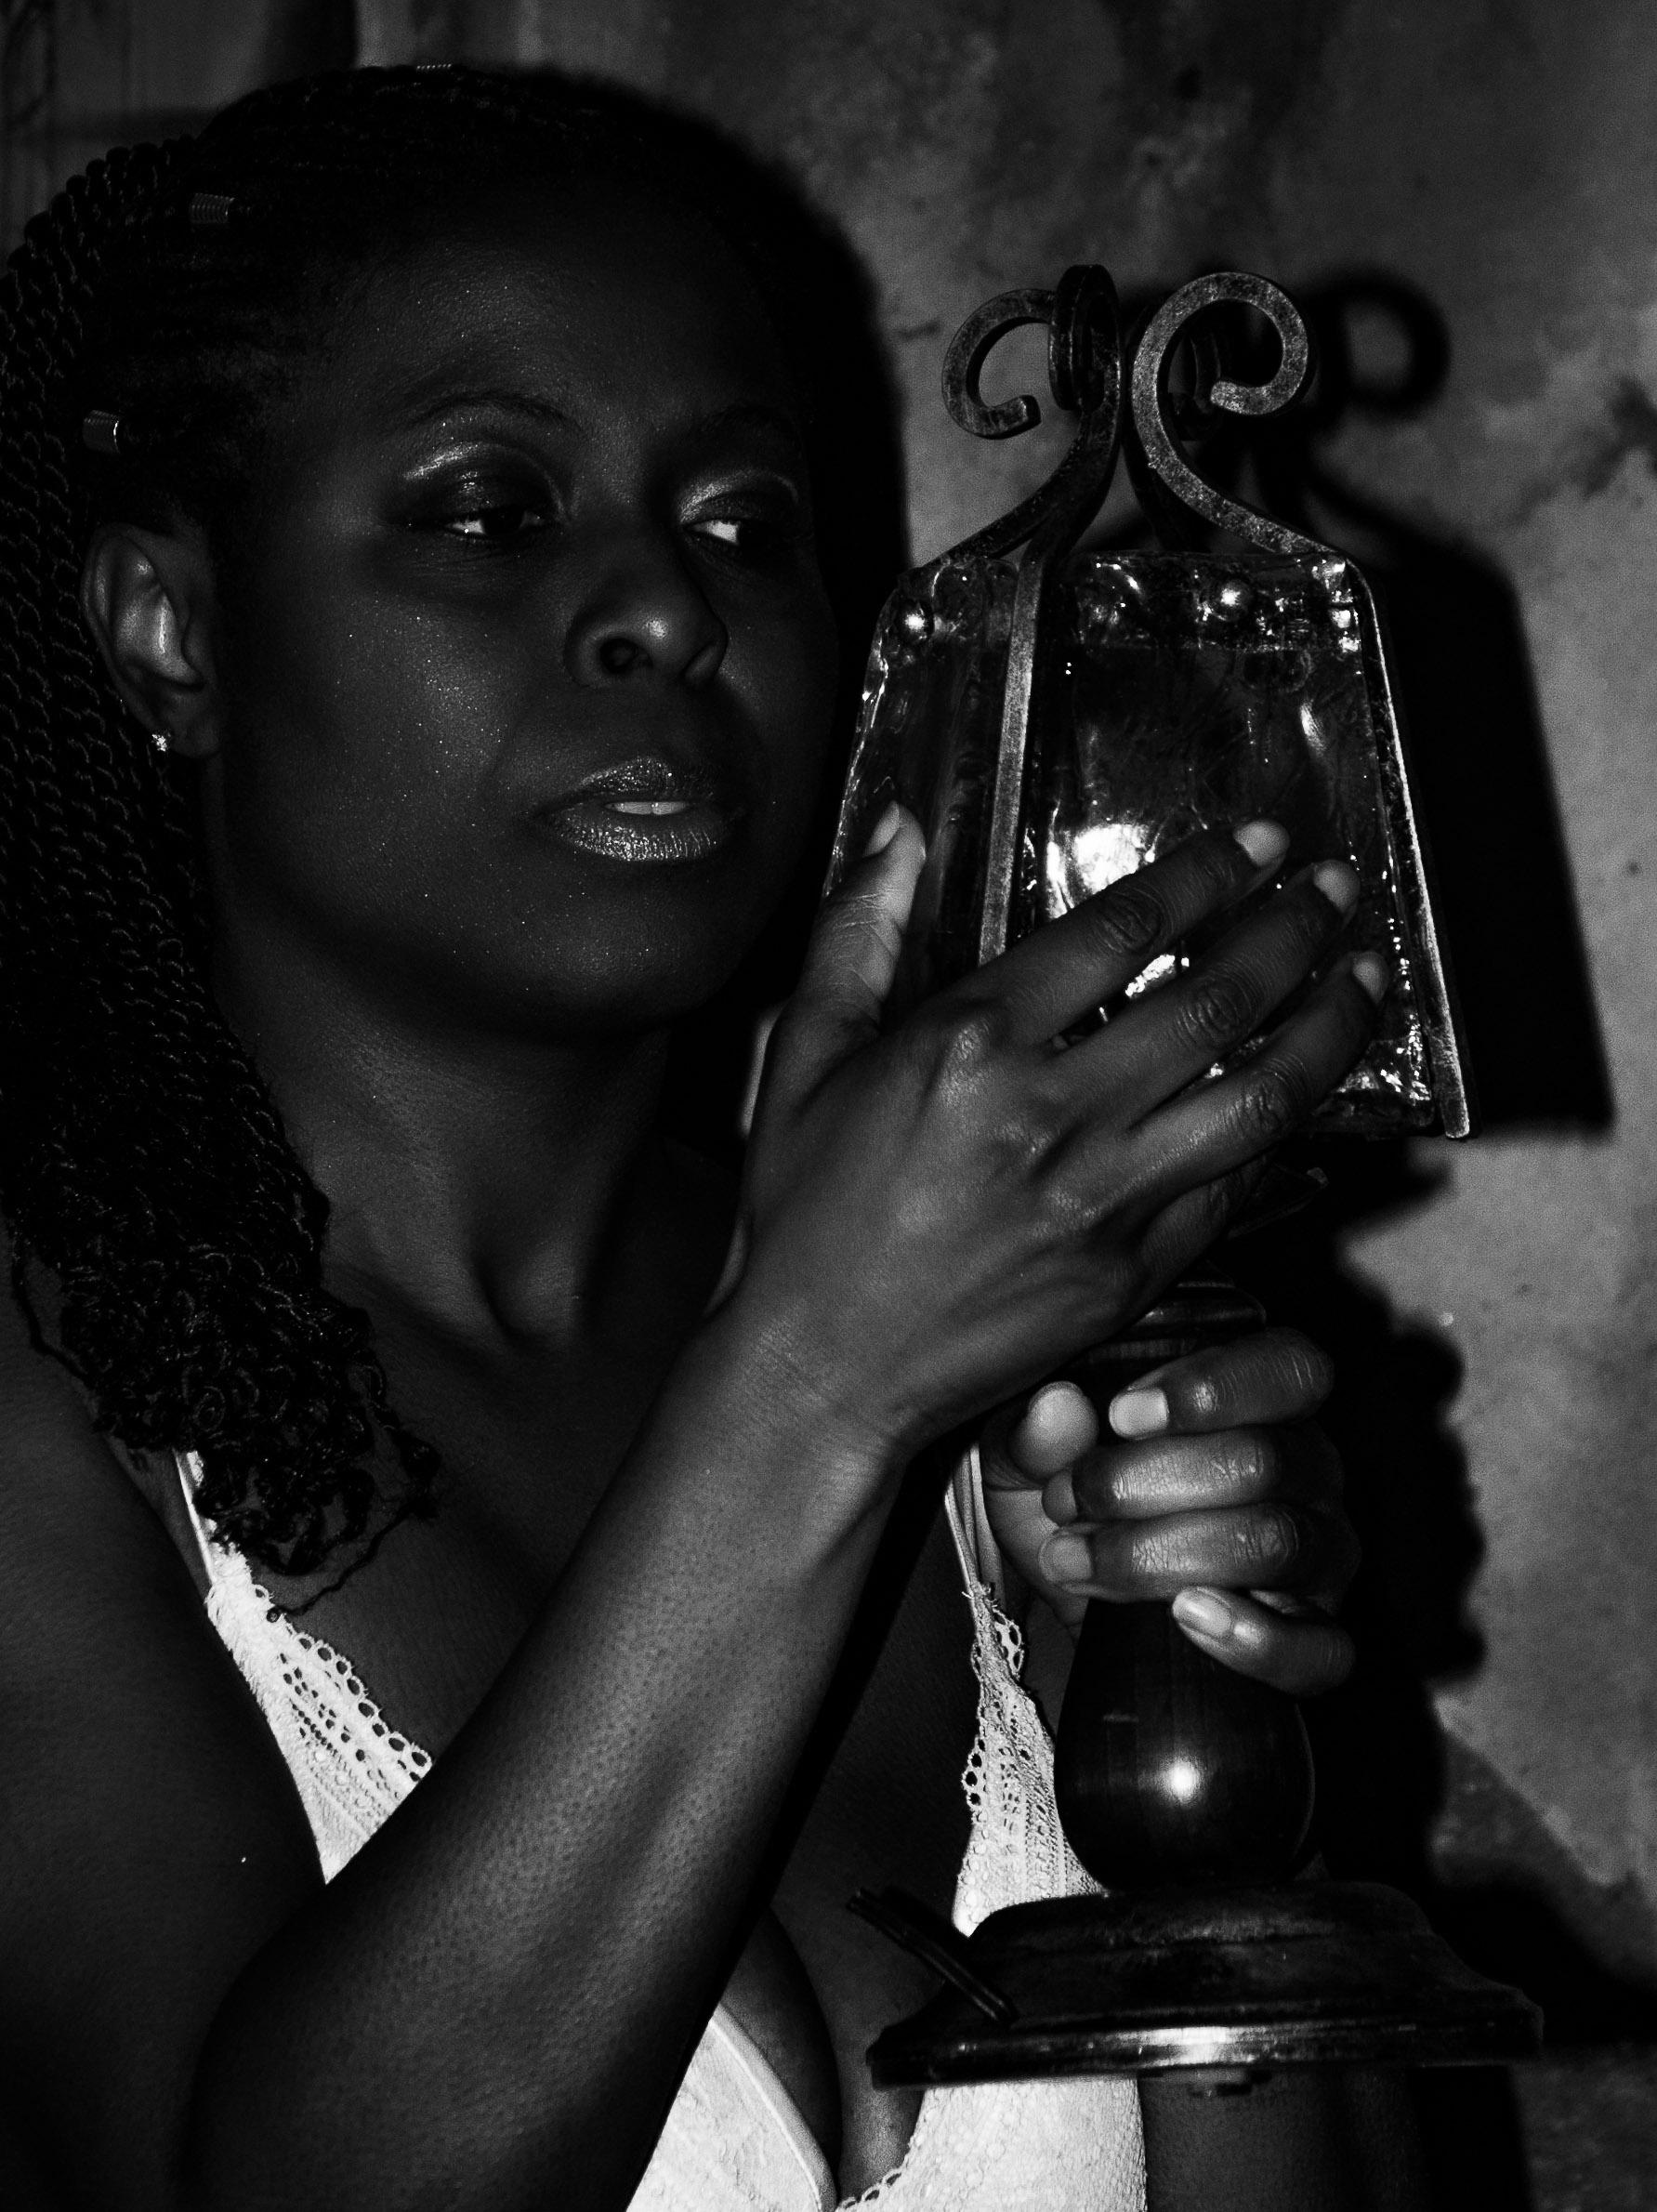 Categorie: Fine Art, Portrait; Photo: ALESSIO CUNEGO; Model & MUA: _dark_lady34; Location: Ex manicomio di Mombello – LIMBIATE (MI)